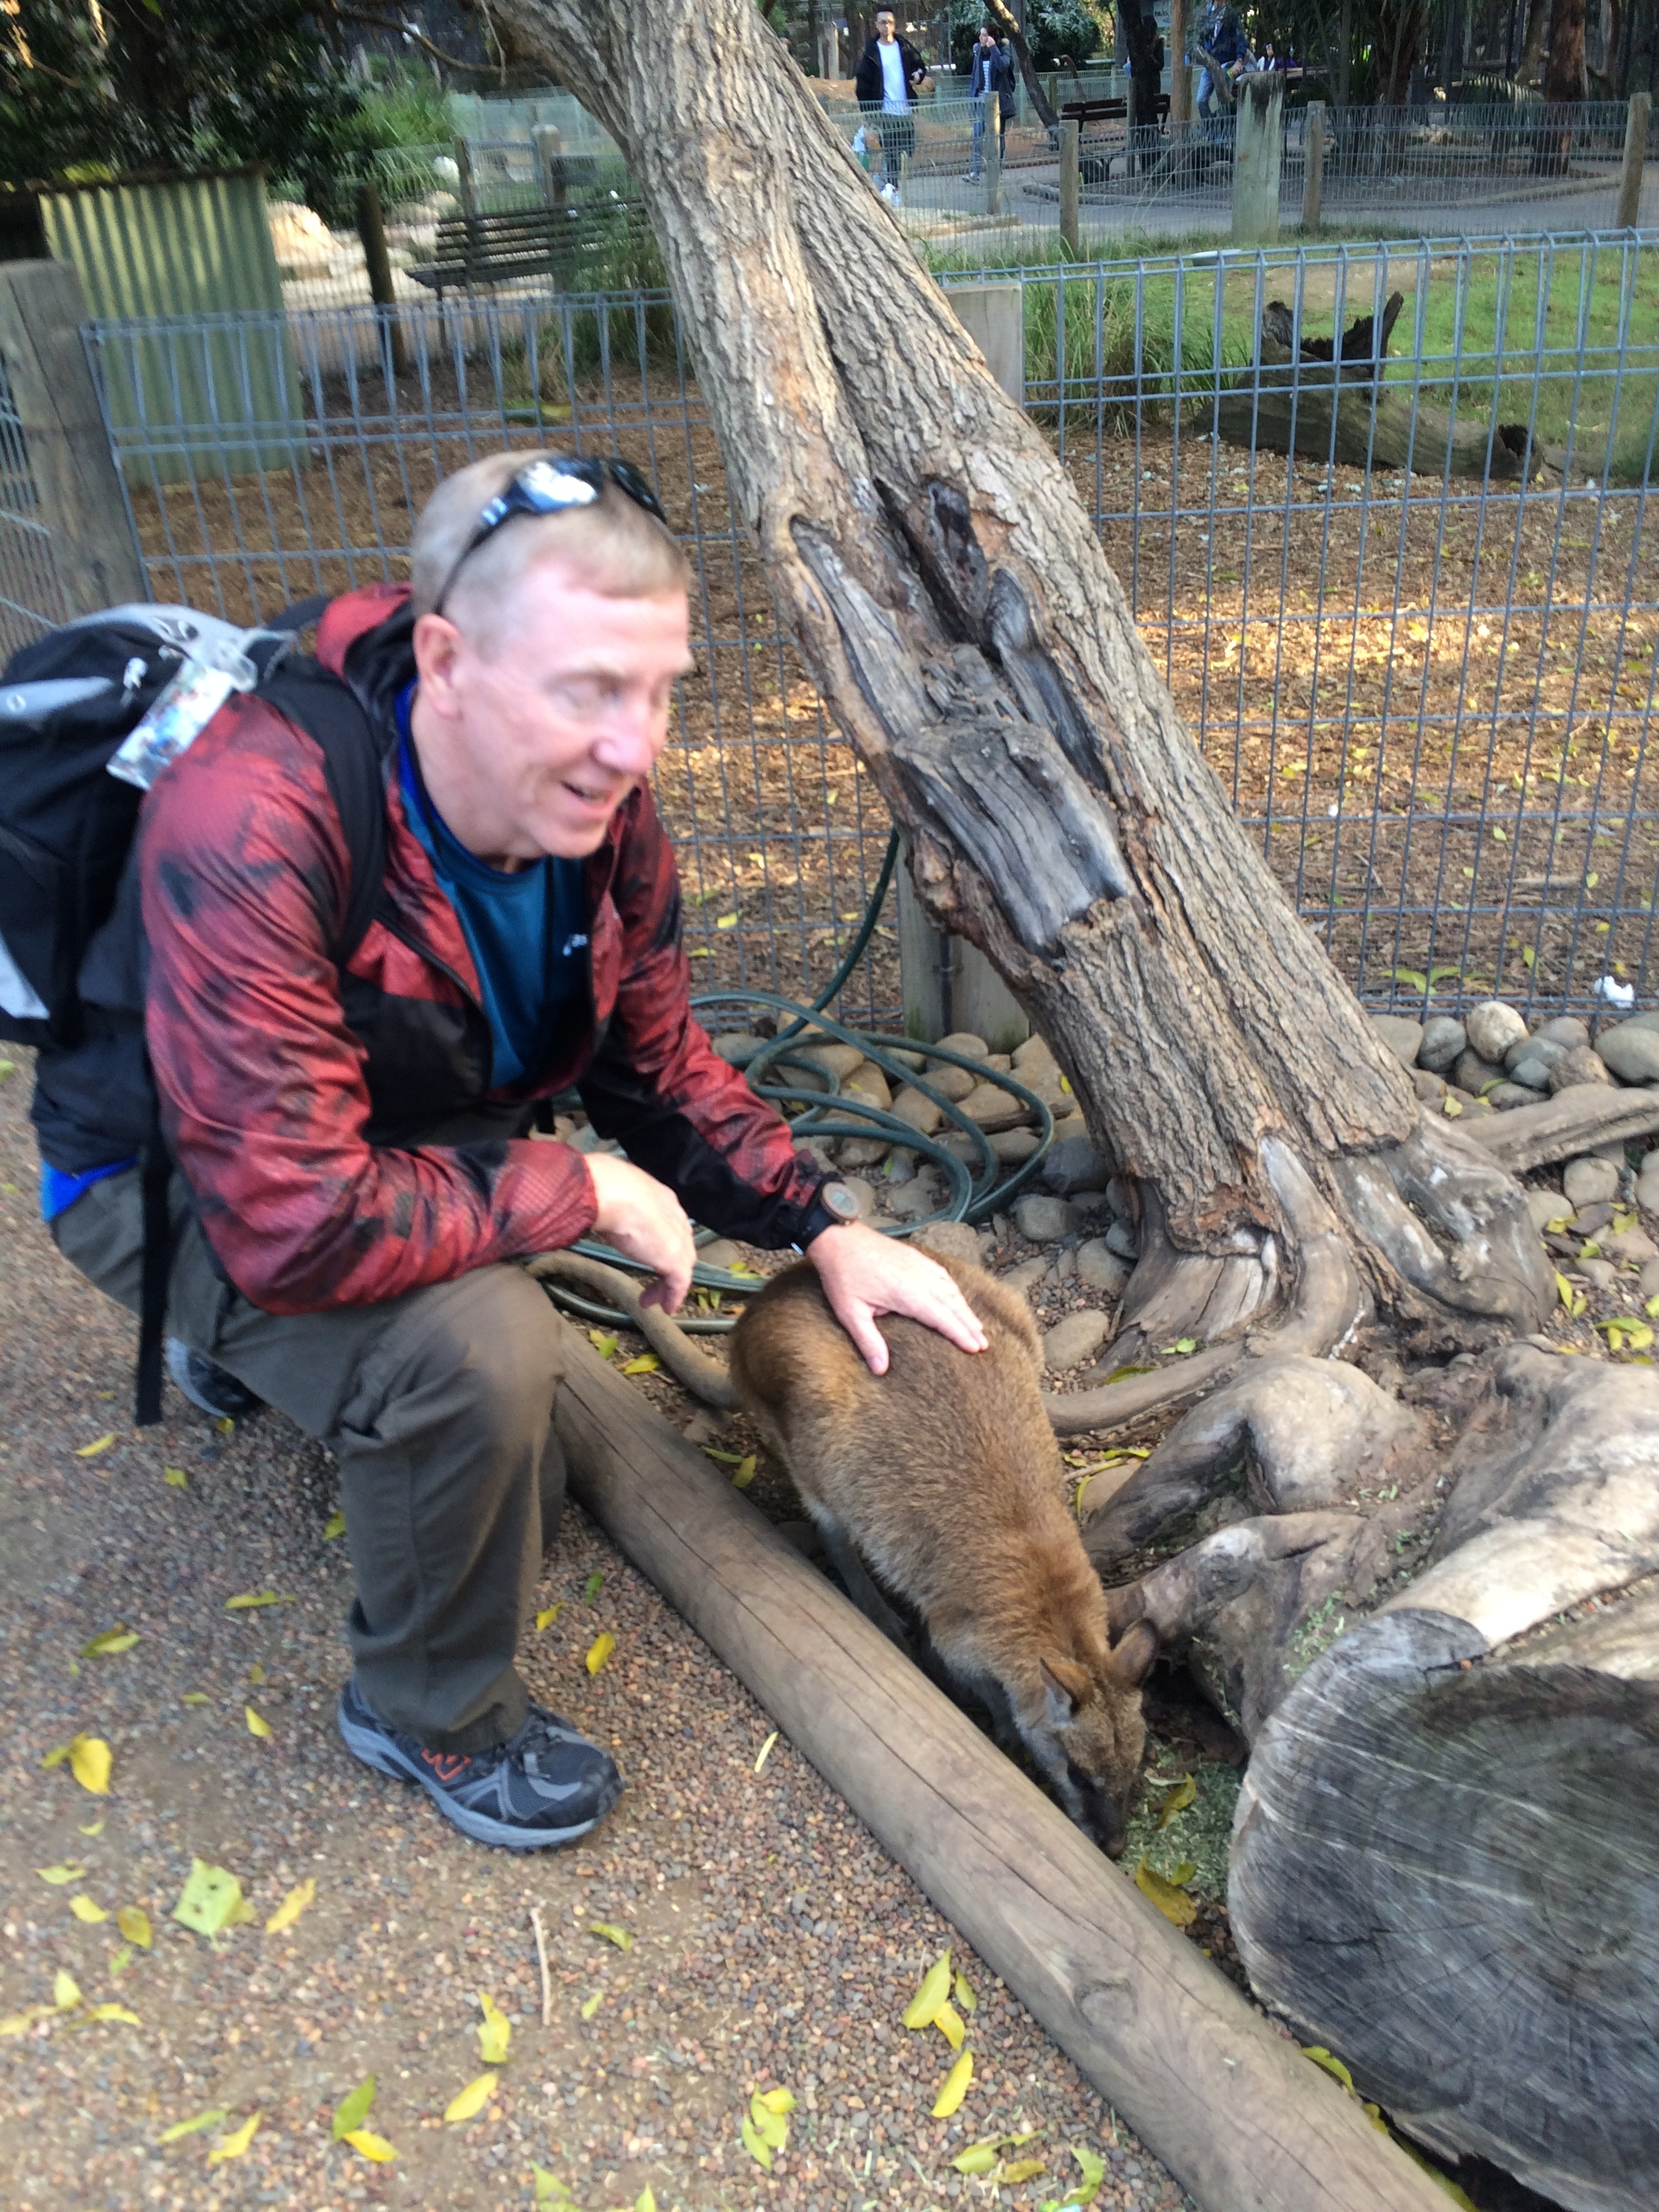 Chip and the Kangaroos